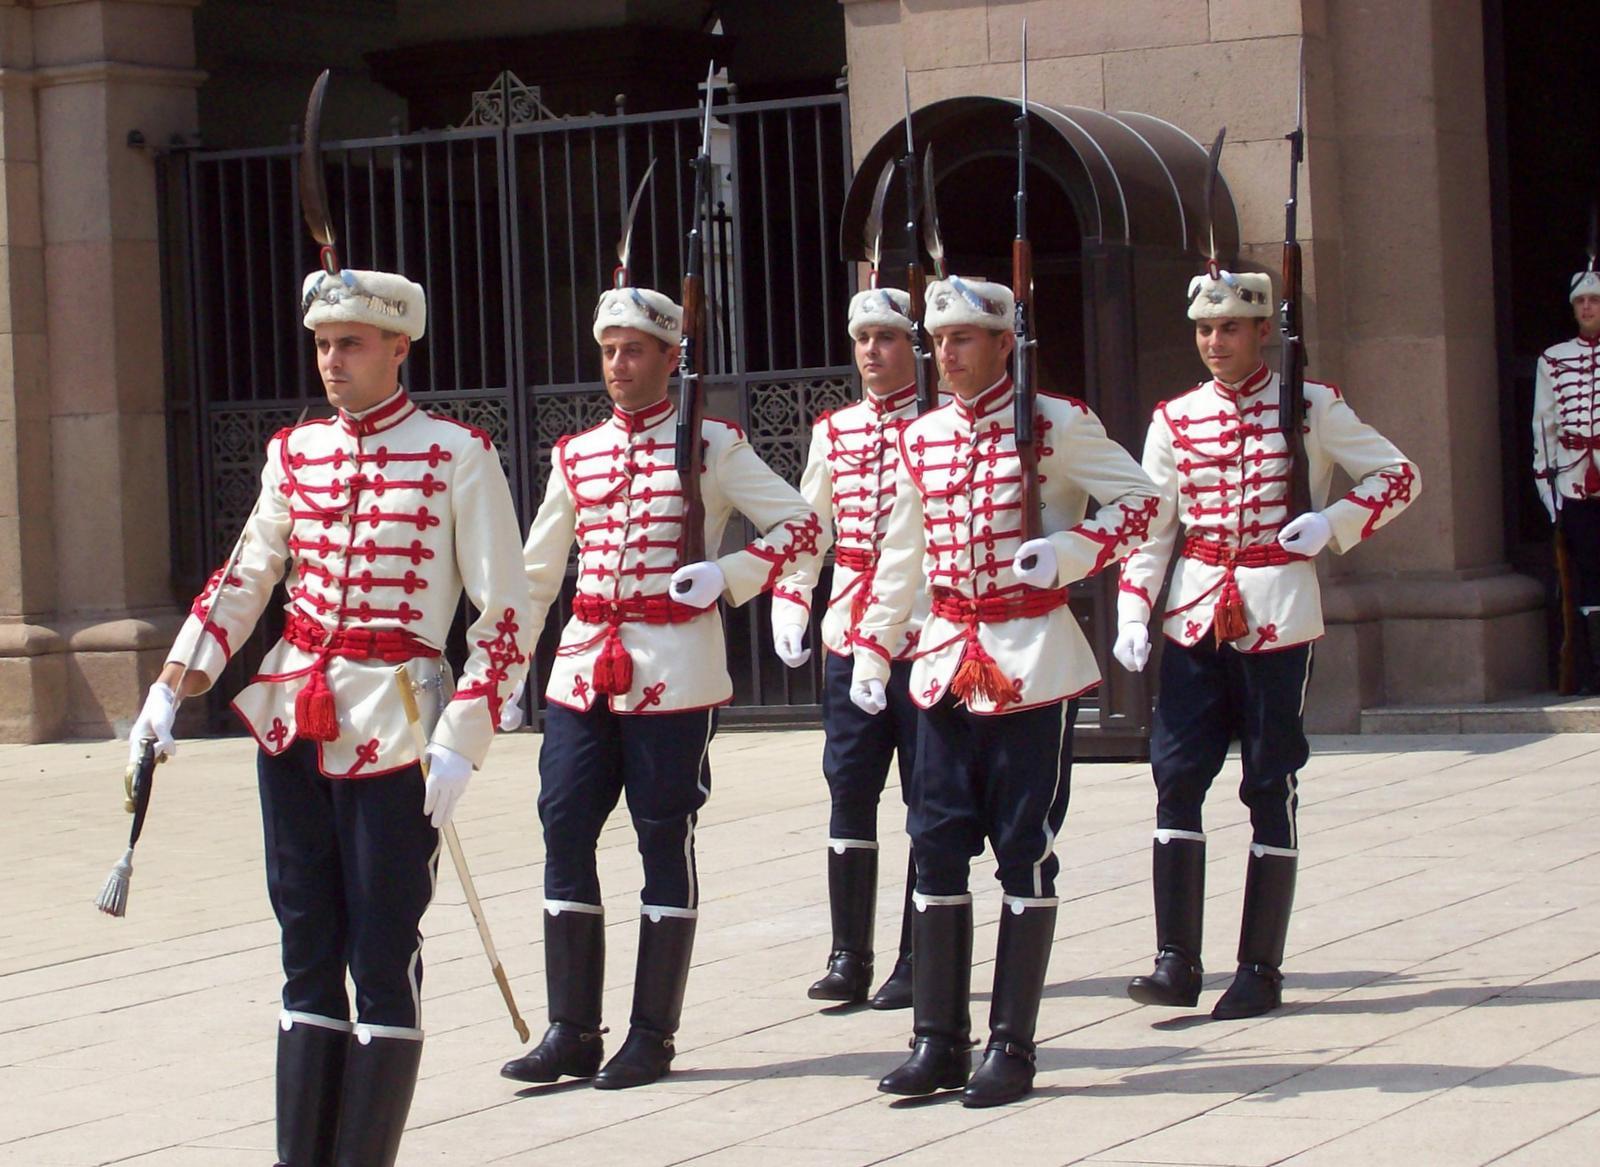 Wache vor dem Präsidentenpalast in Sofia